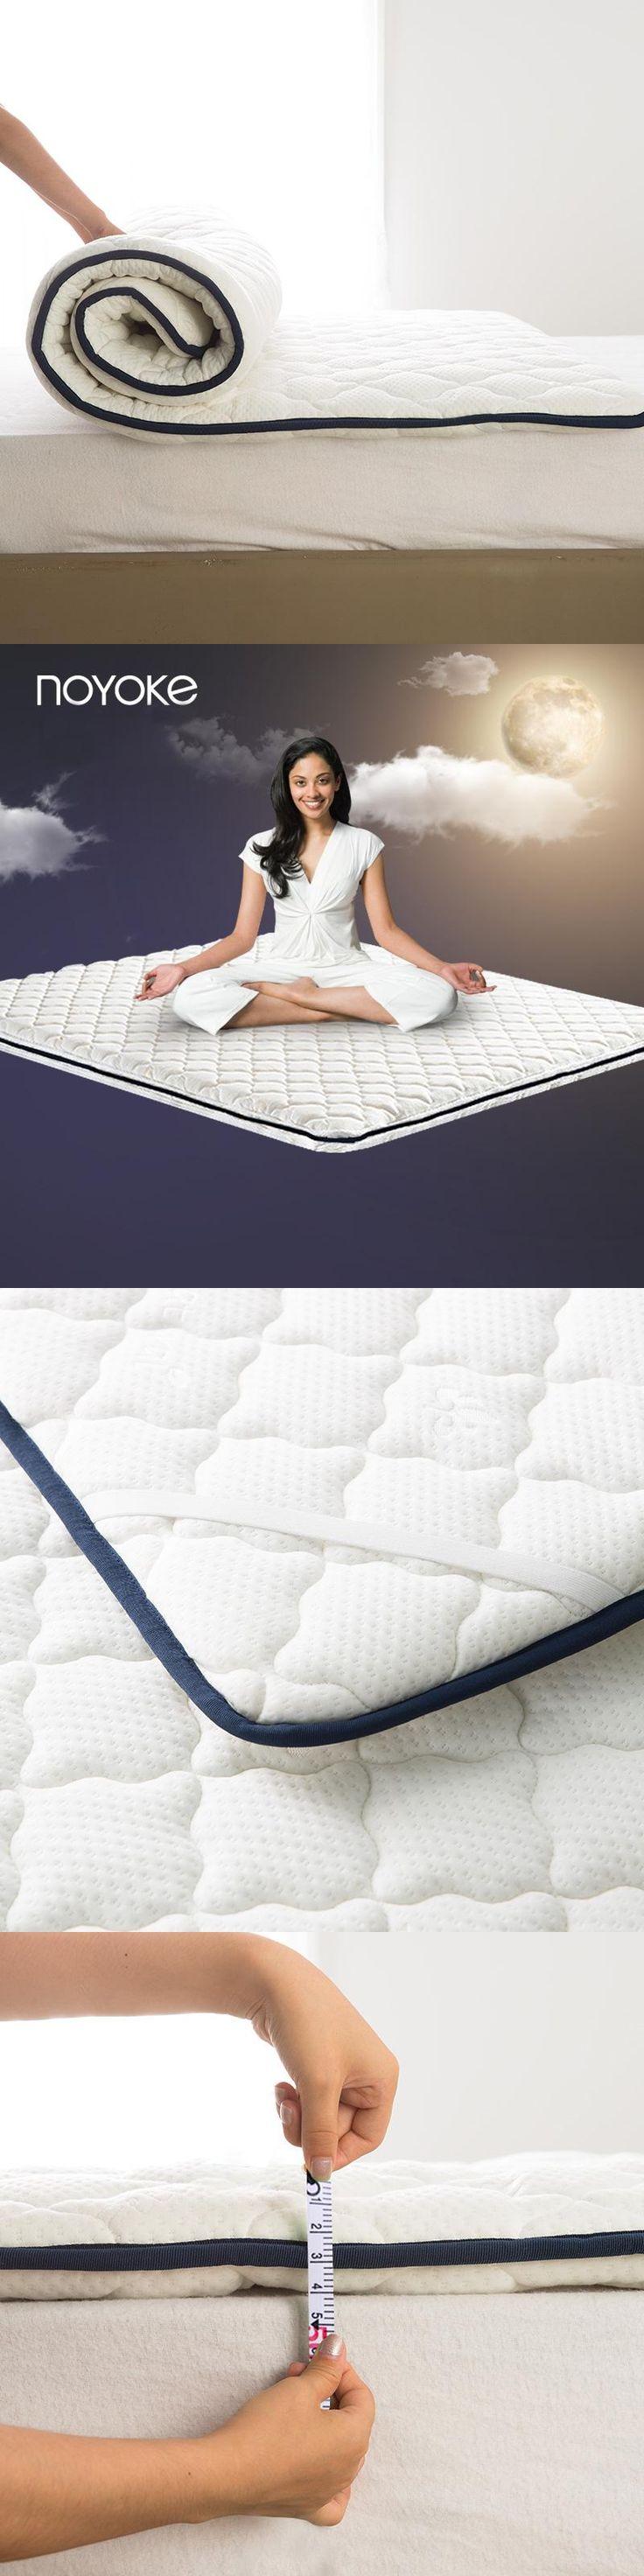 Noyoke Natural Latex Mattress Thickness 4 Cm Folding Soft Tatami Fit For 3 Feet Bed